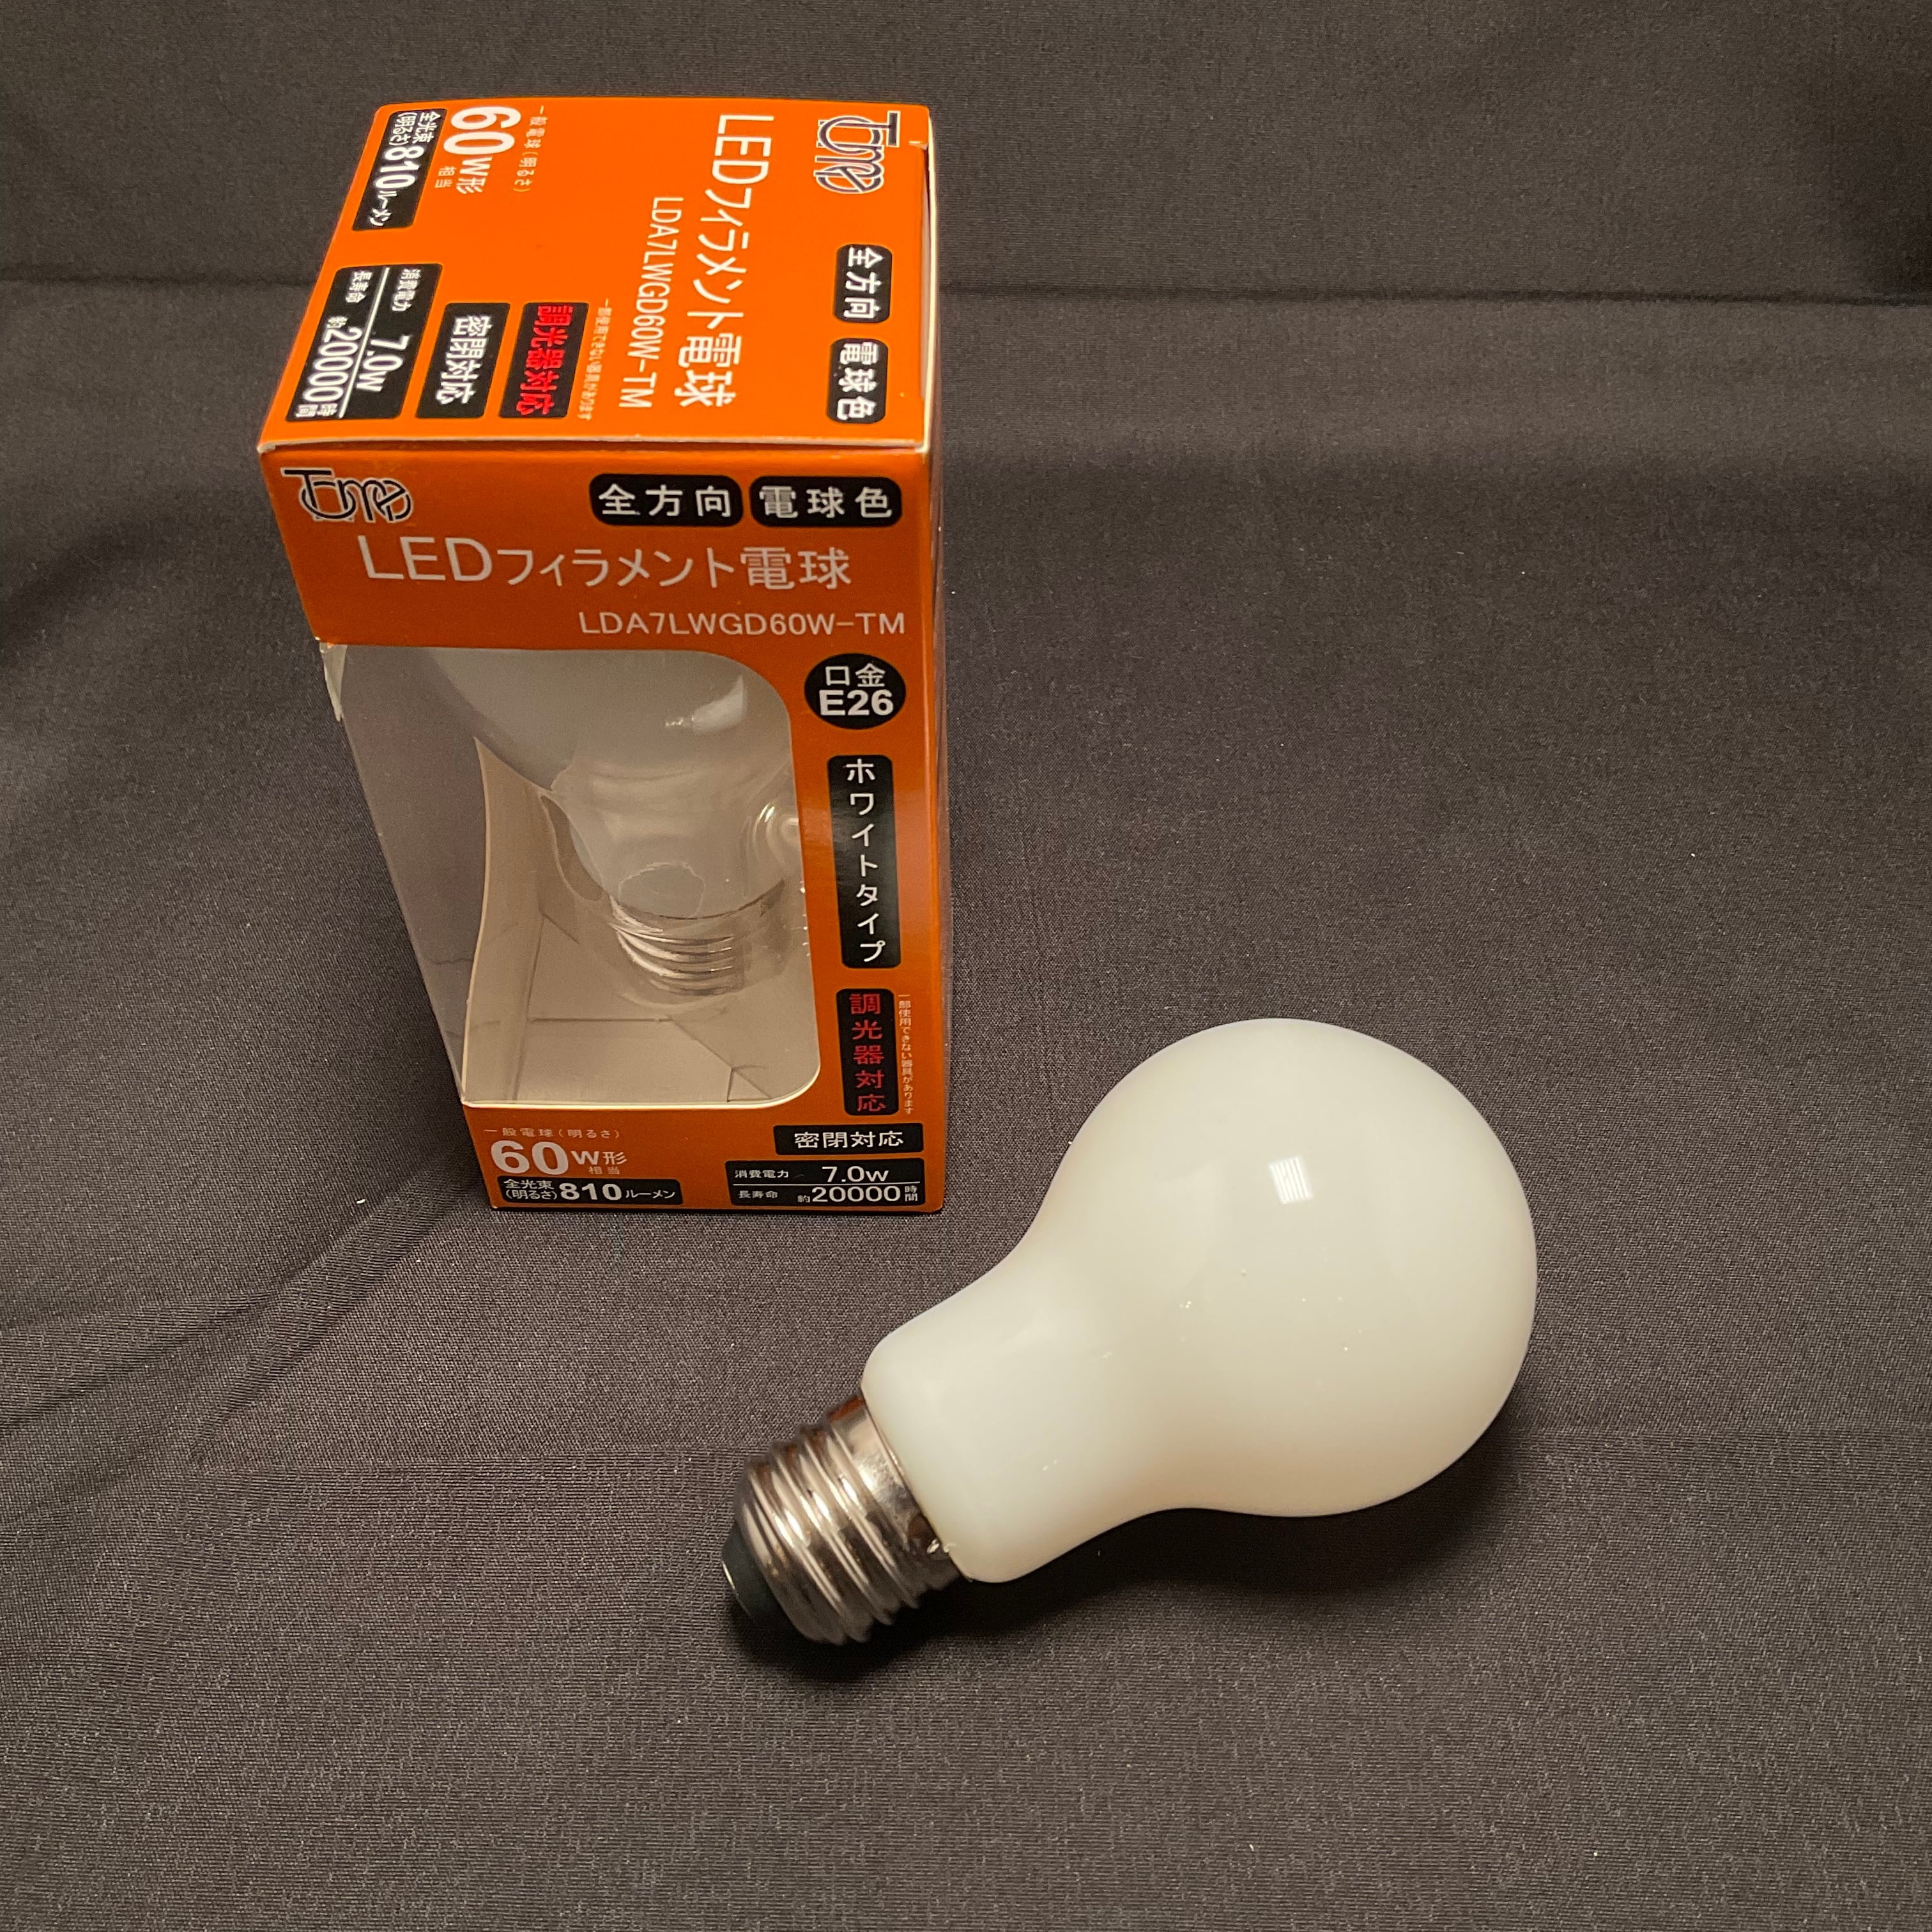 E26 60W相当《調光器対応》 フィラメント型 ホワイトタイプ(LED電球)